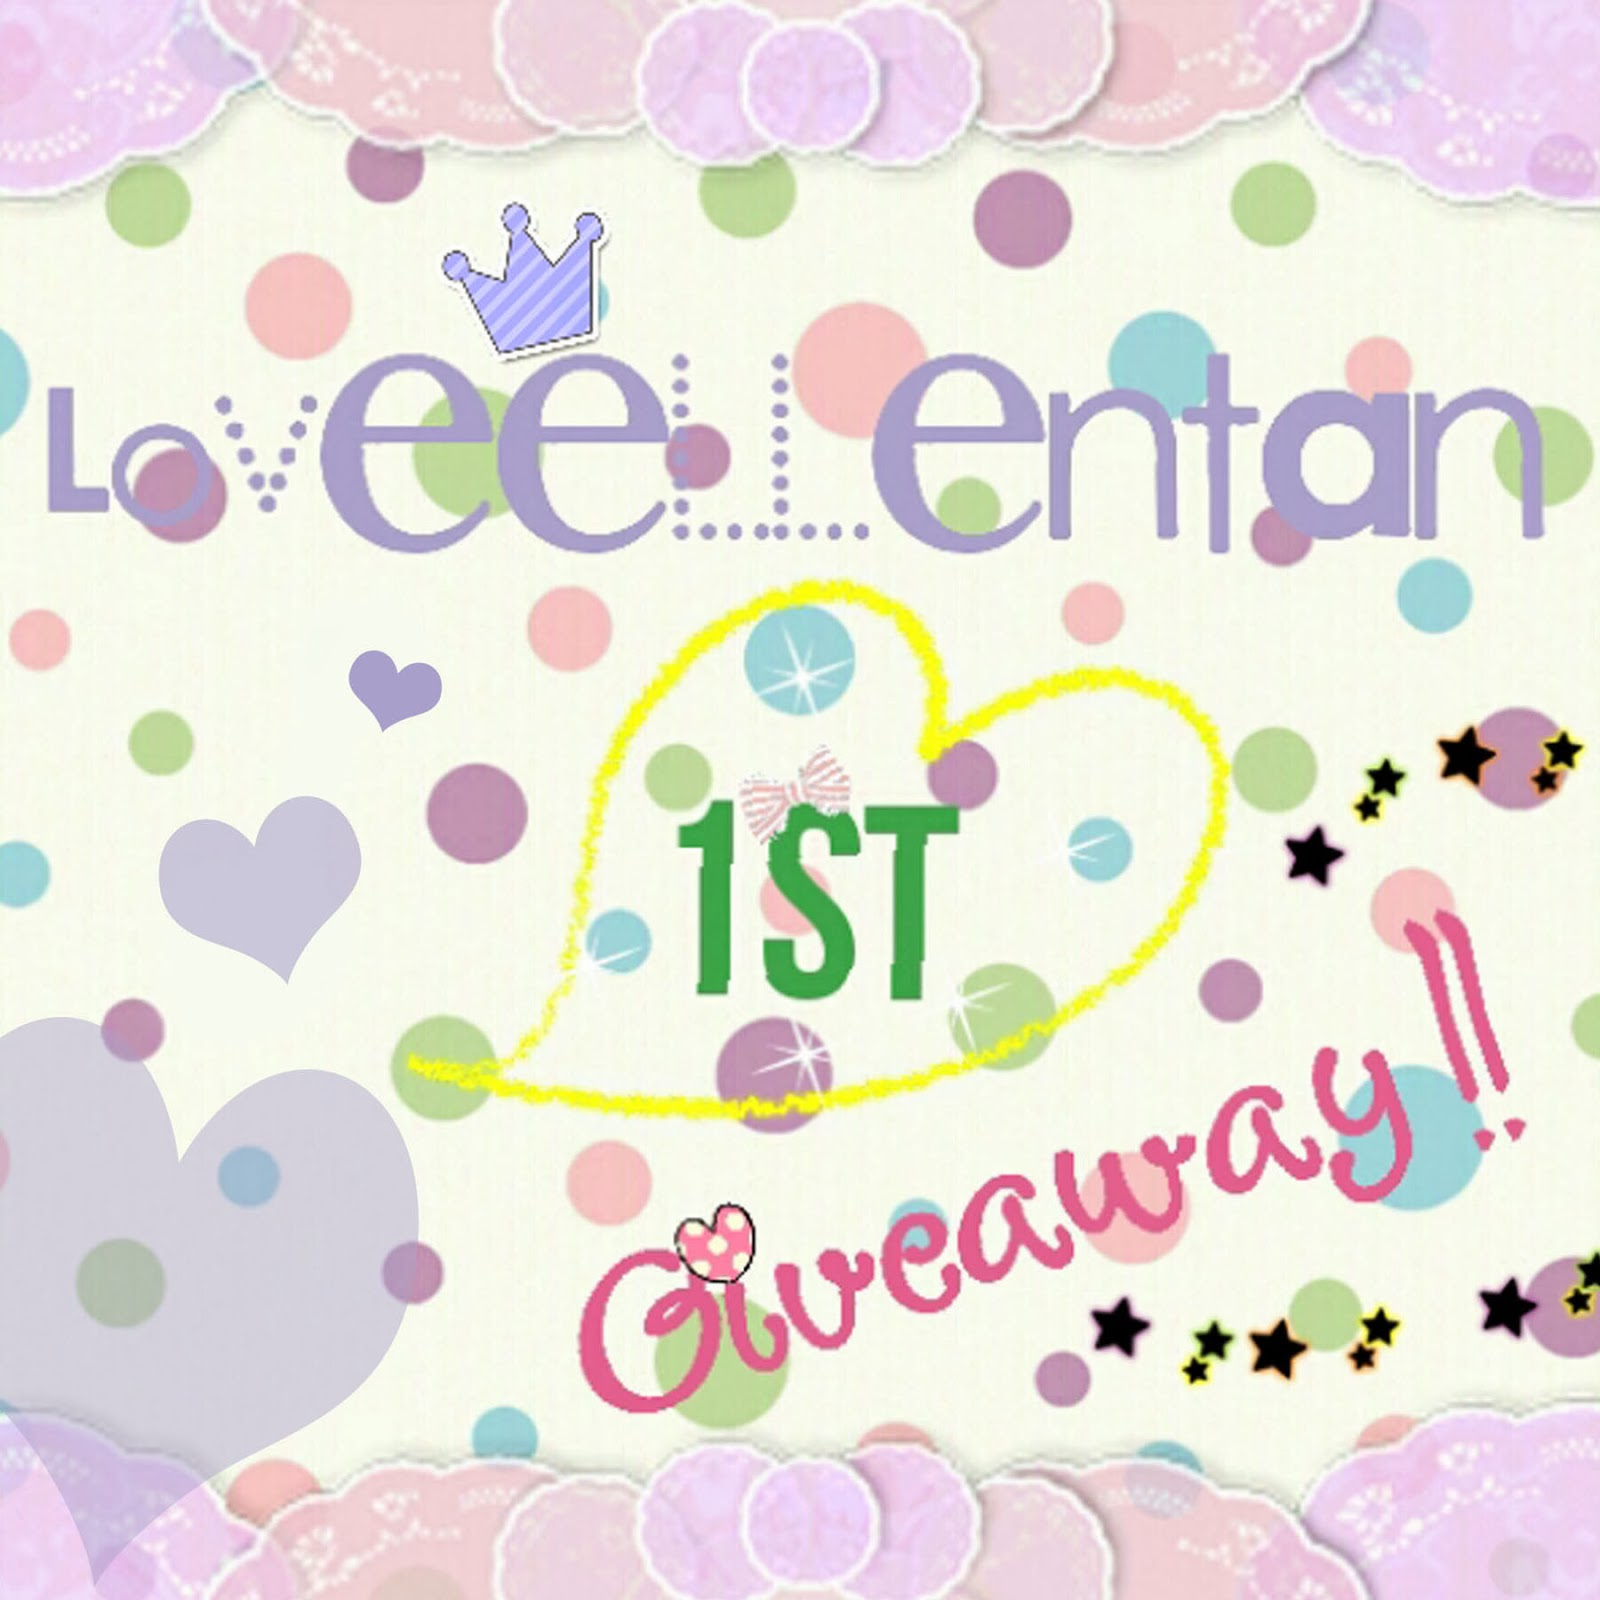 http://loveellentan.blogspot.com/2014/01/loveellentan-1st-giveaway.html